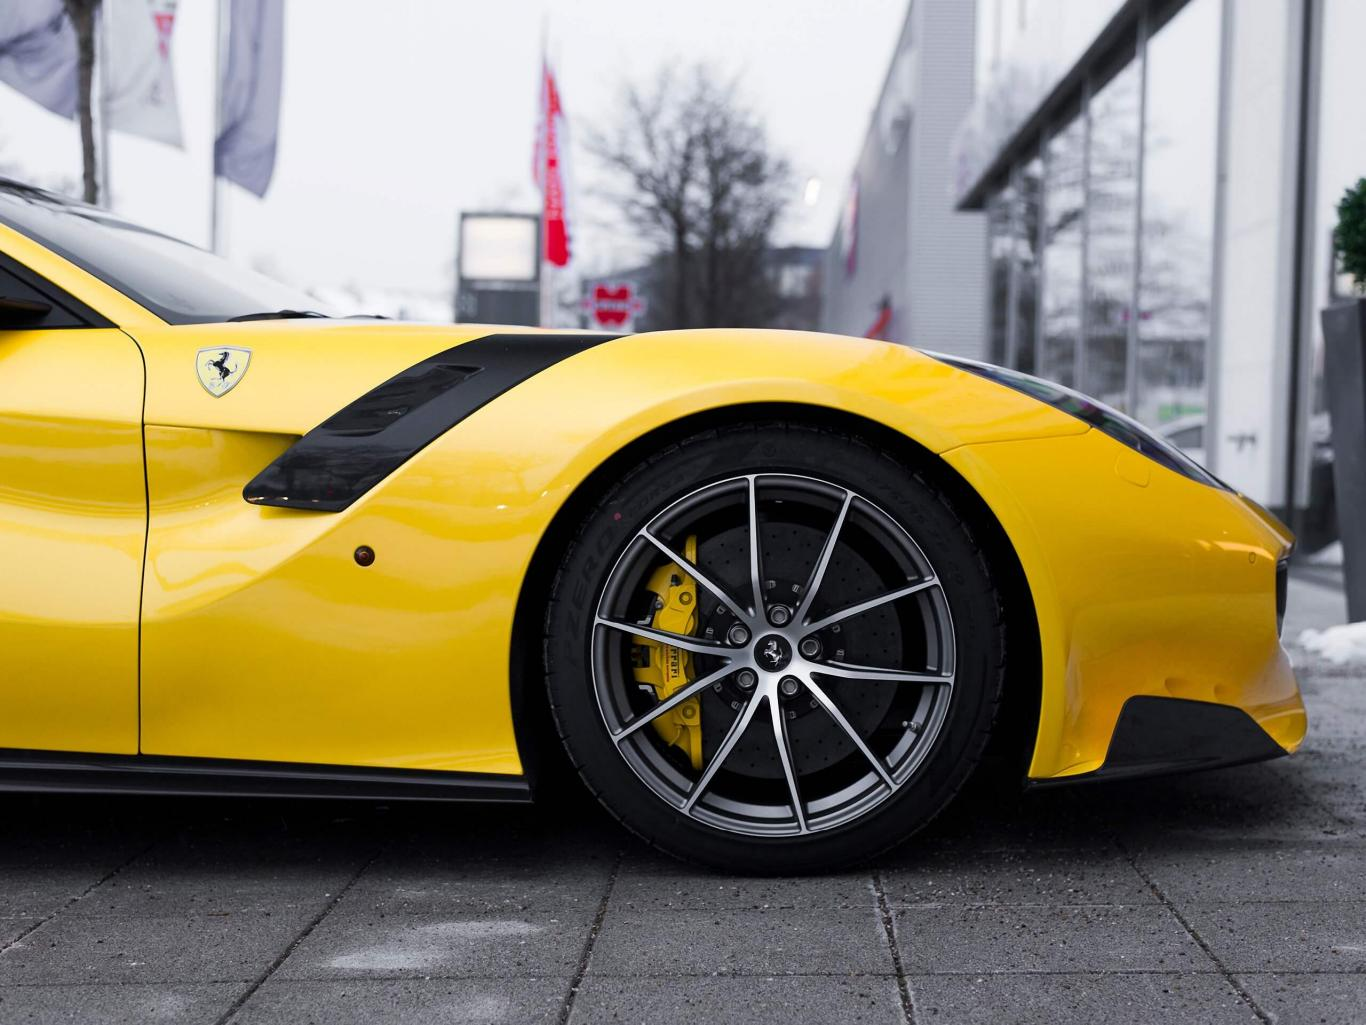 Ferrari F12 TDF 1 OF 799 UNITS